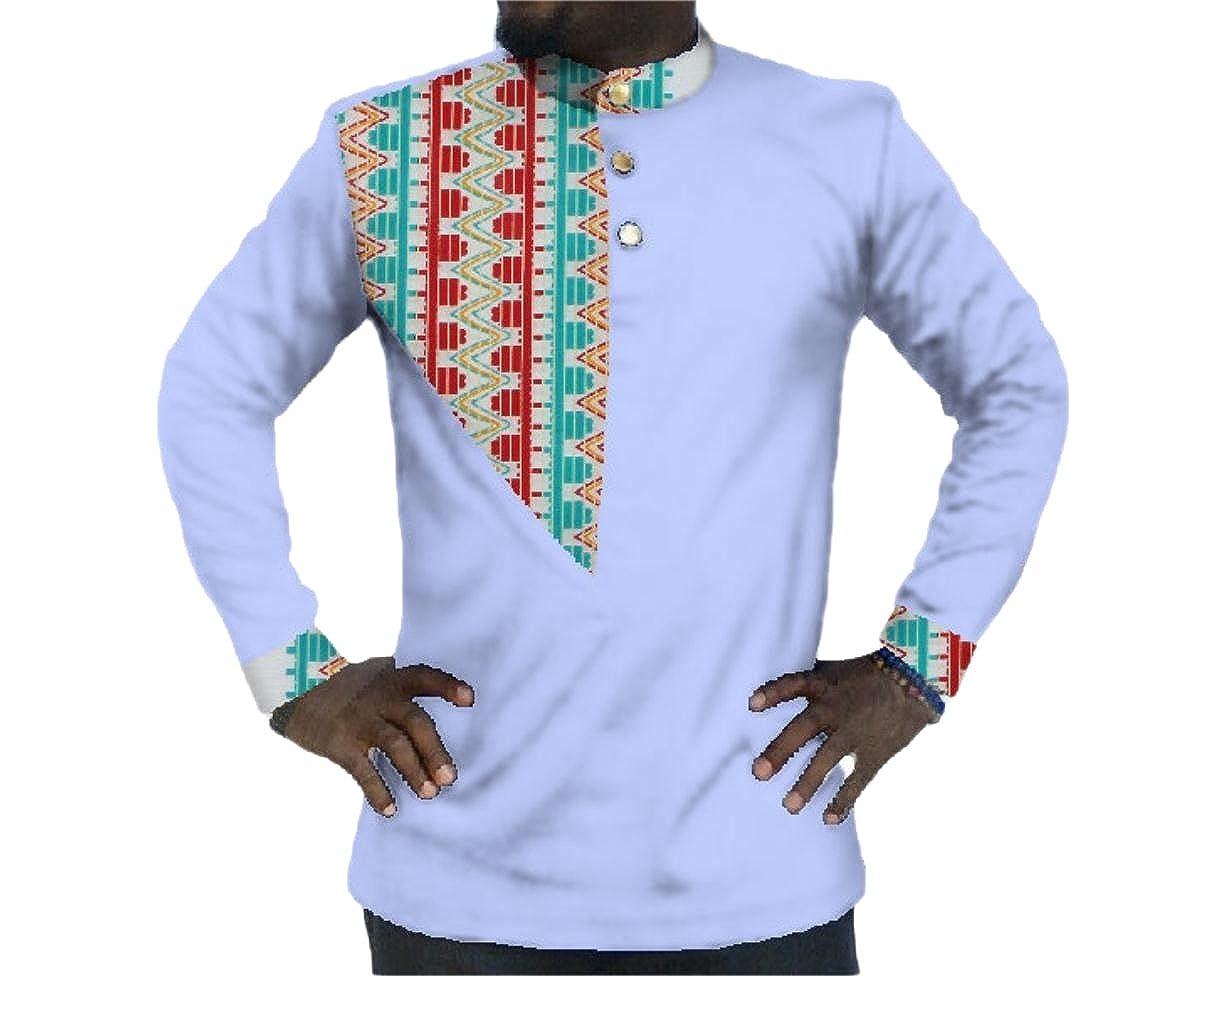 Fieer Mens Batik Comfort Tops Plus Size Dashiki African Print T-Shirts